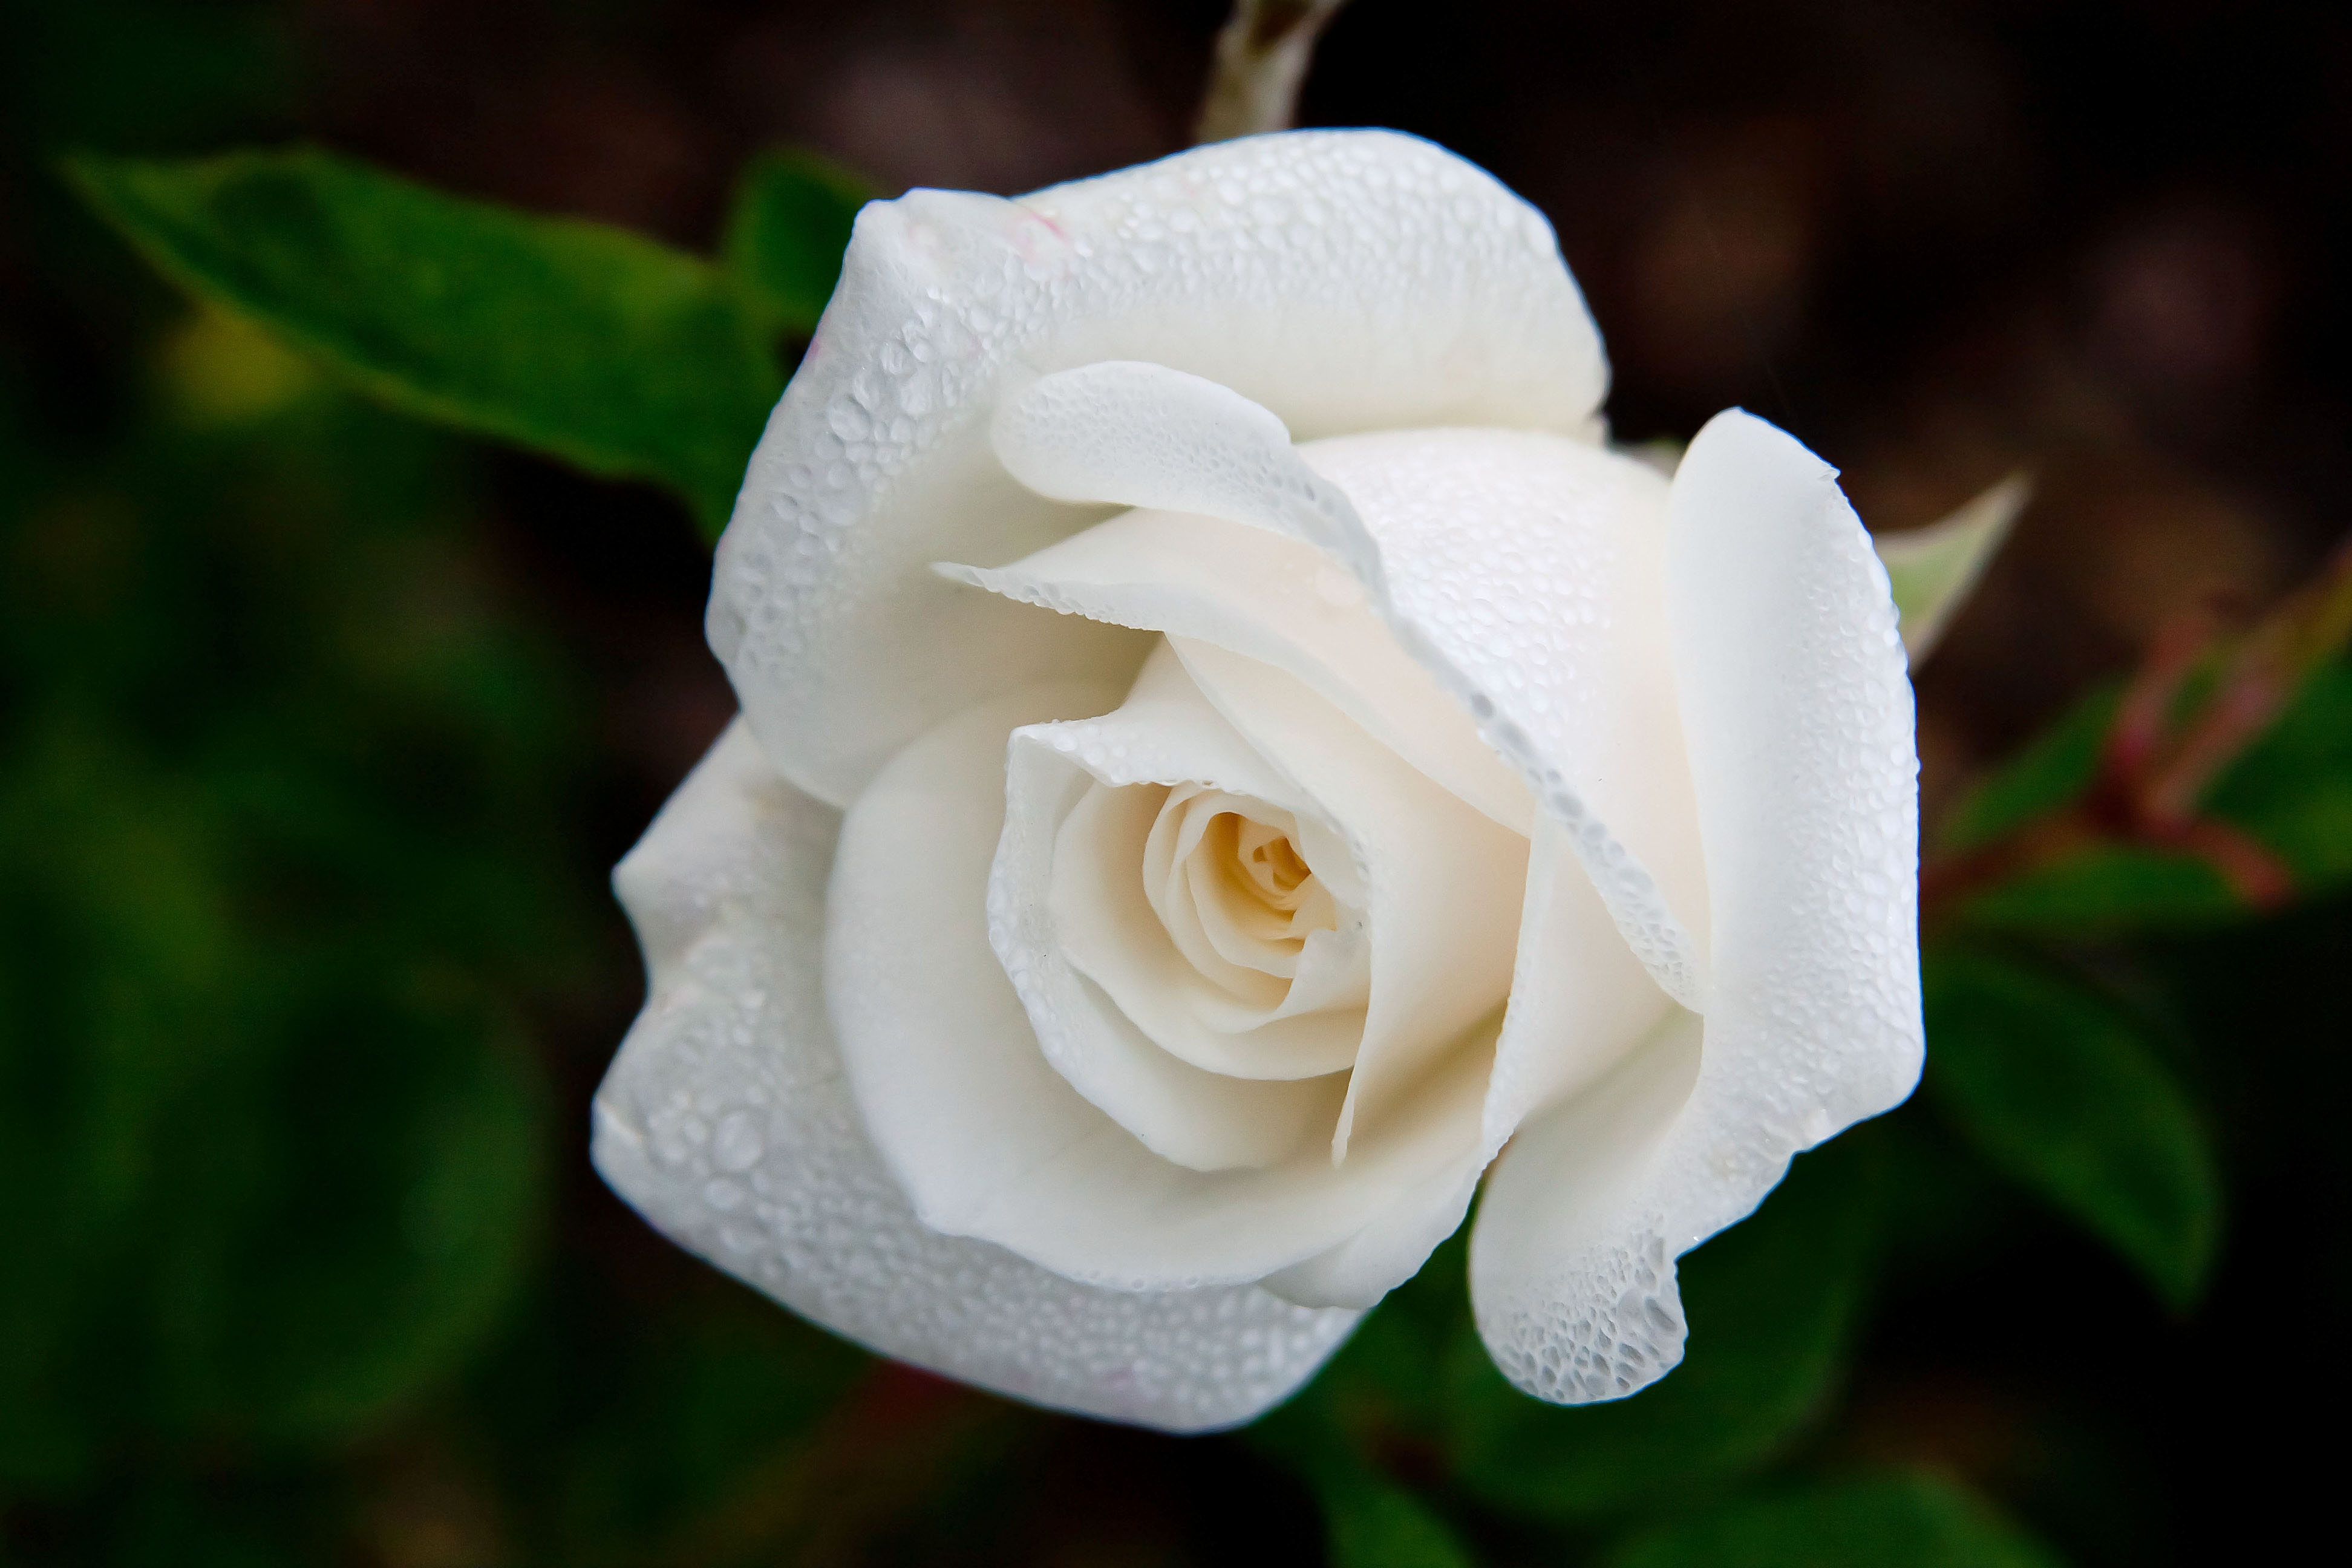 Raining On The Roses